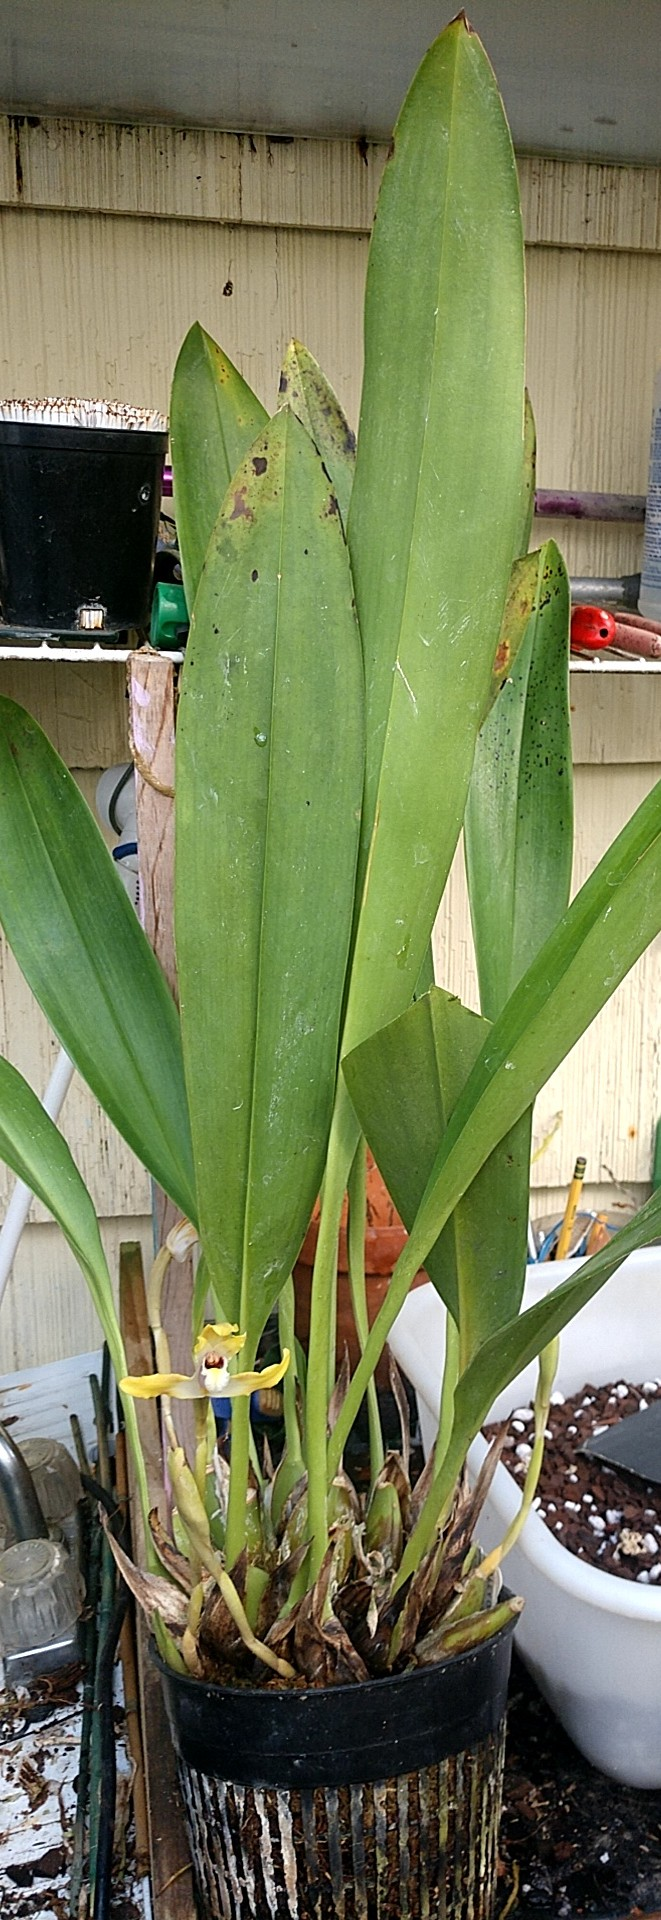 yellowmaxplant0818.jpg